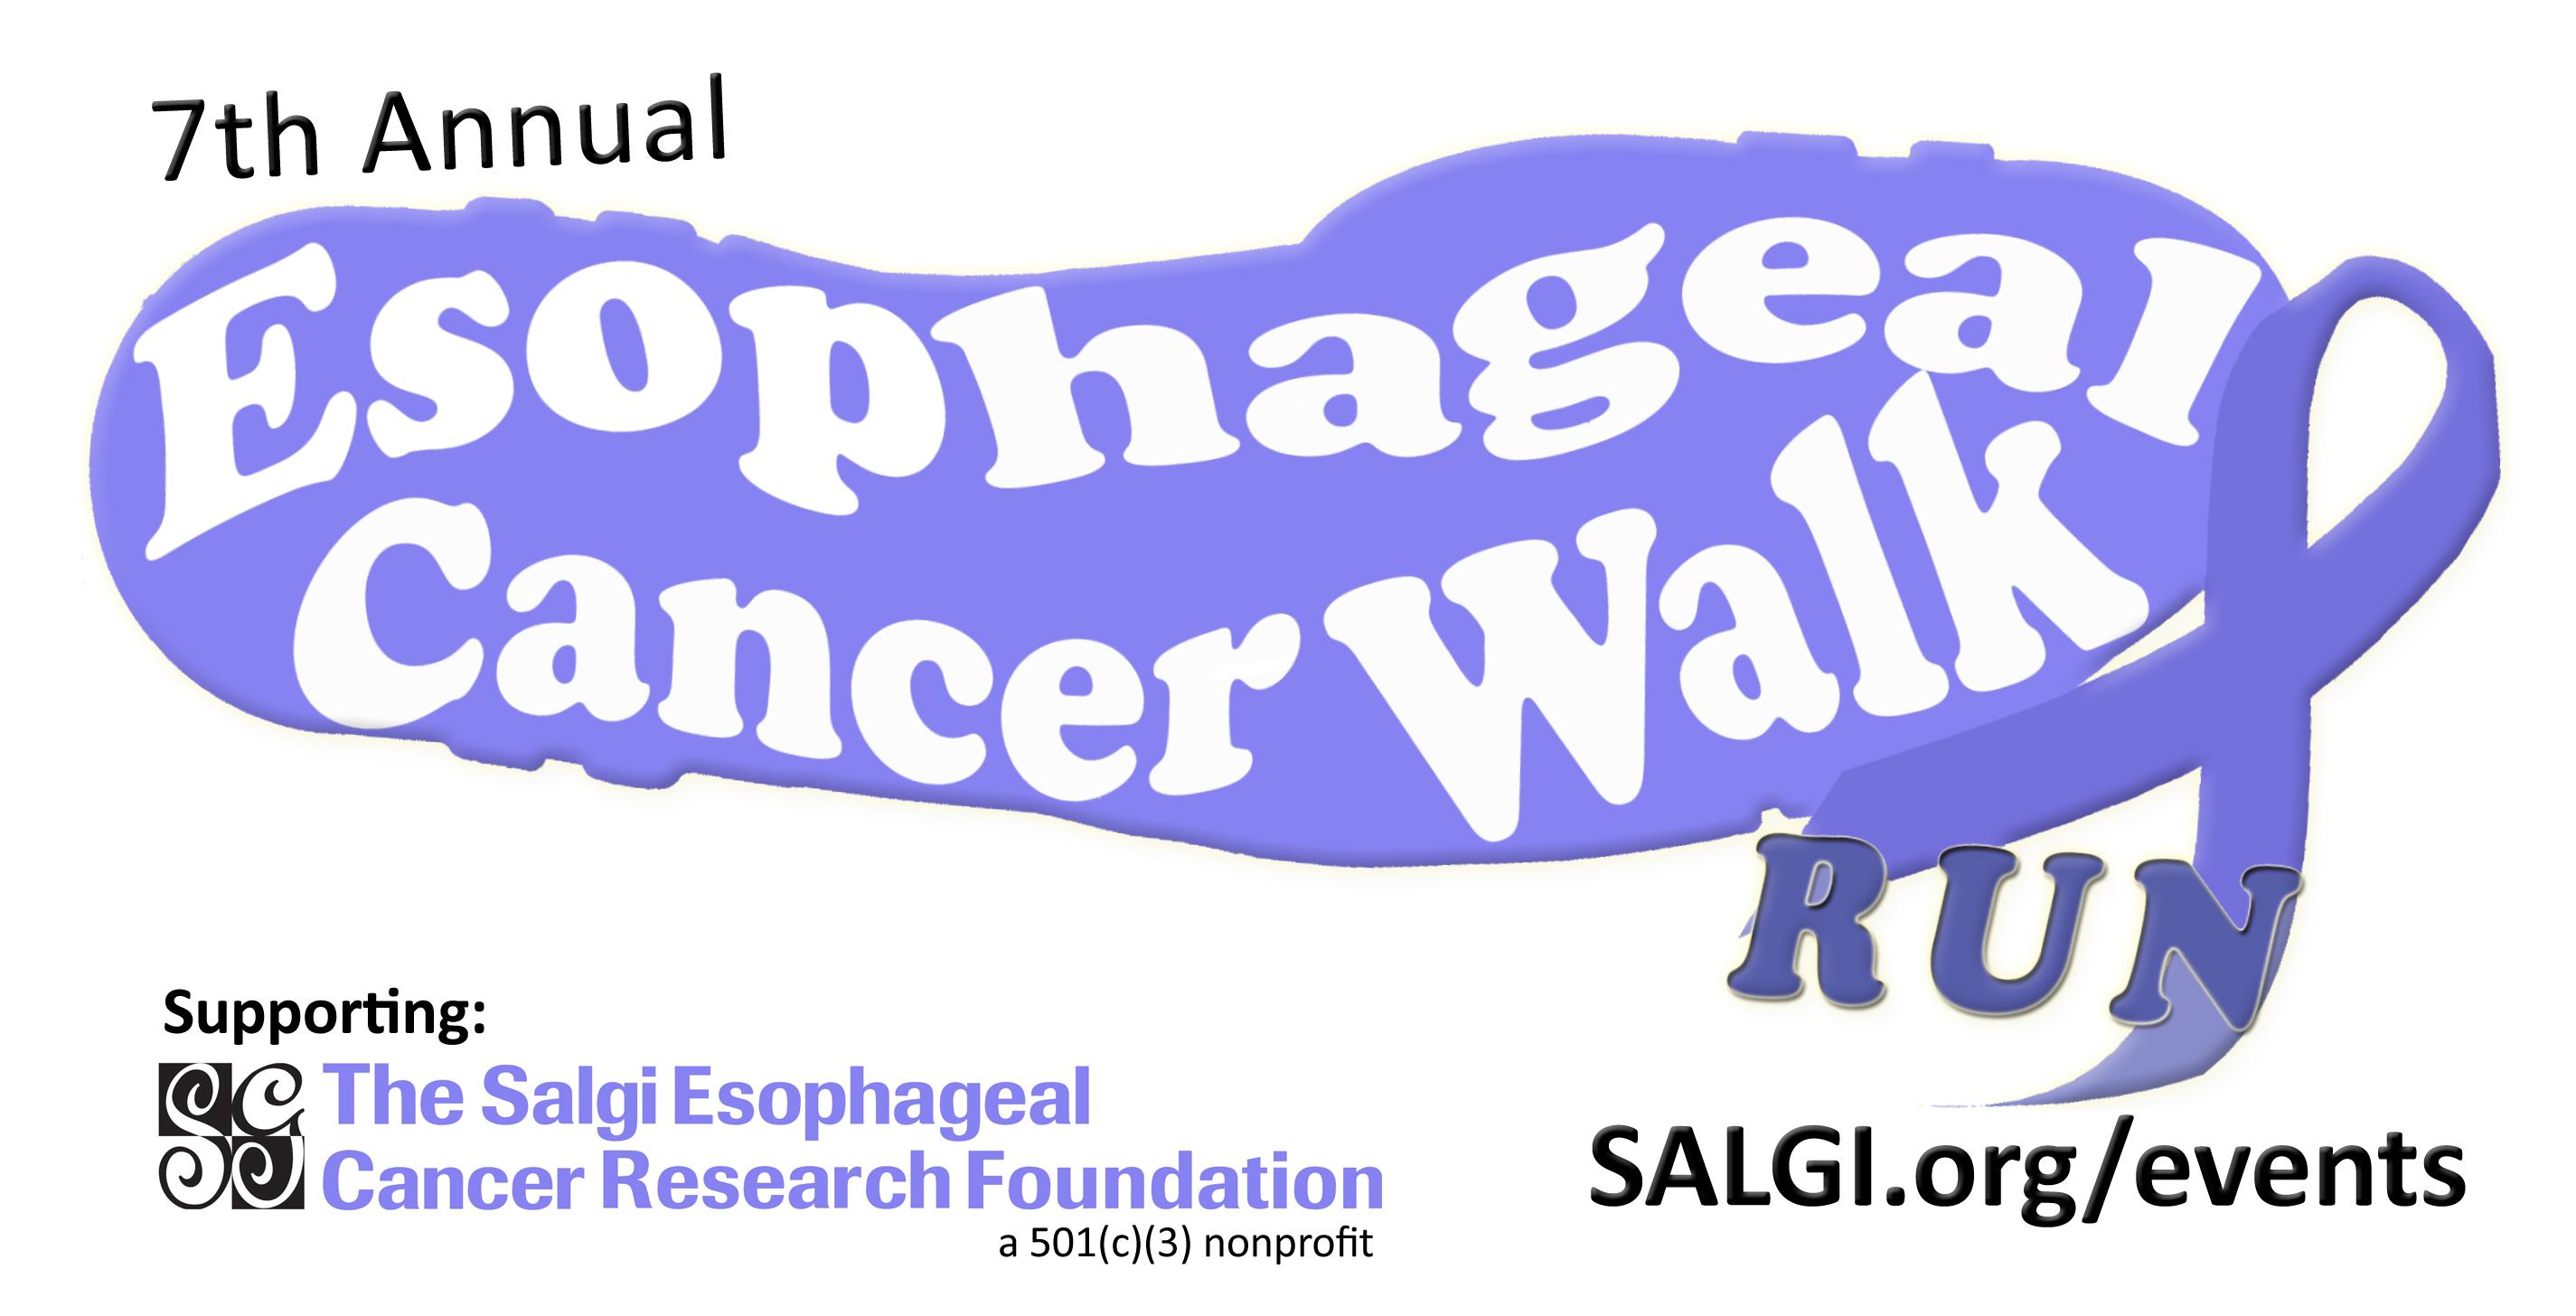 7th annual esophageal cancer walk run rhode island salgi esophageal cancer research foundation nonprofit charity awareness early detection charity walk charity run ri